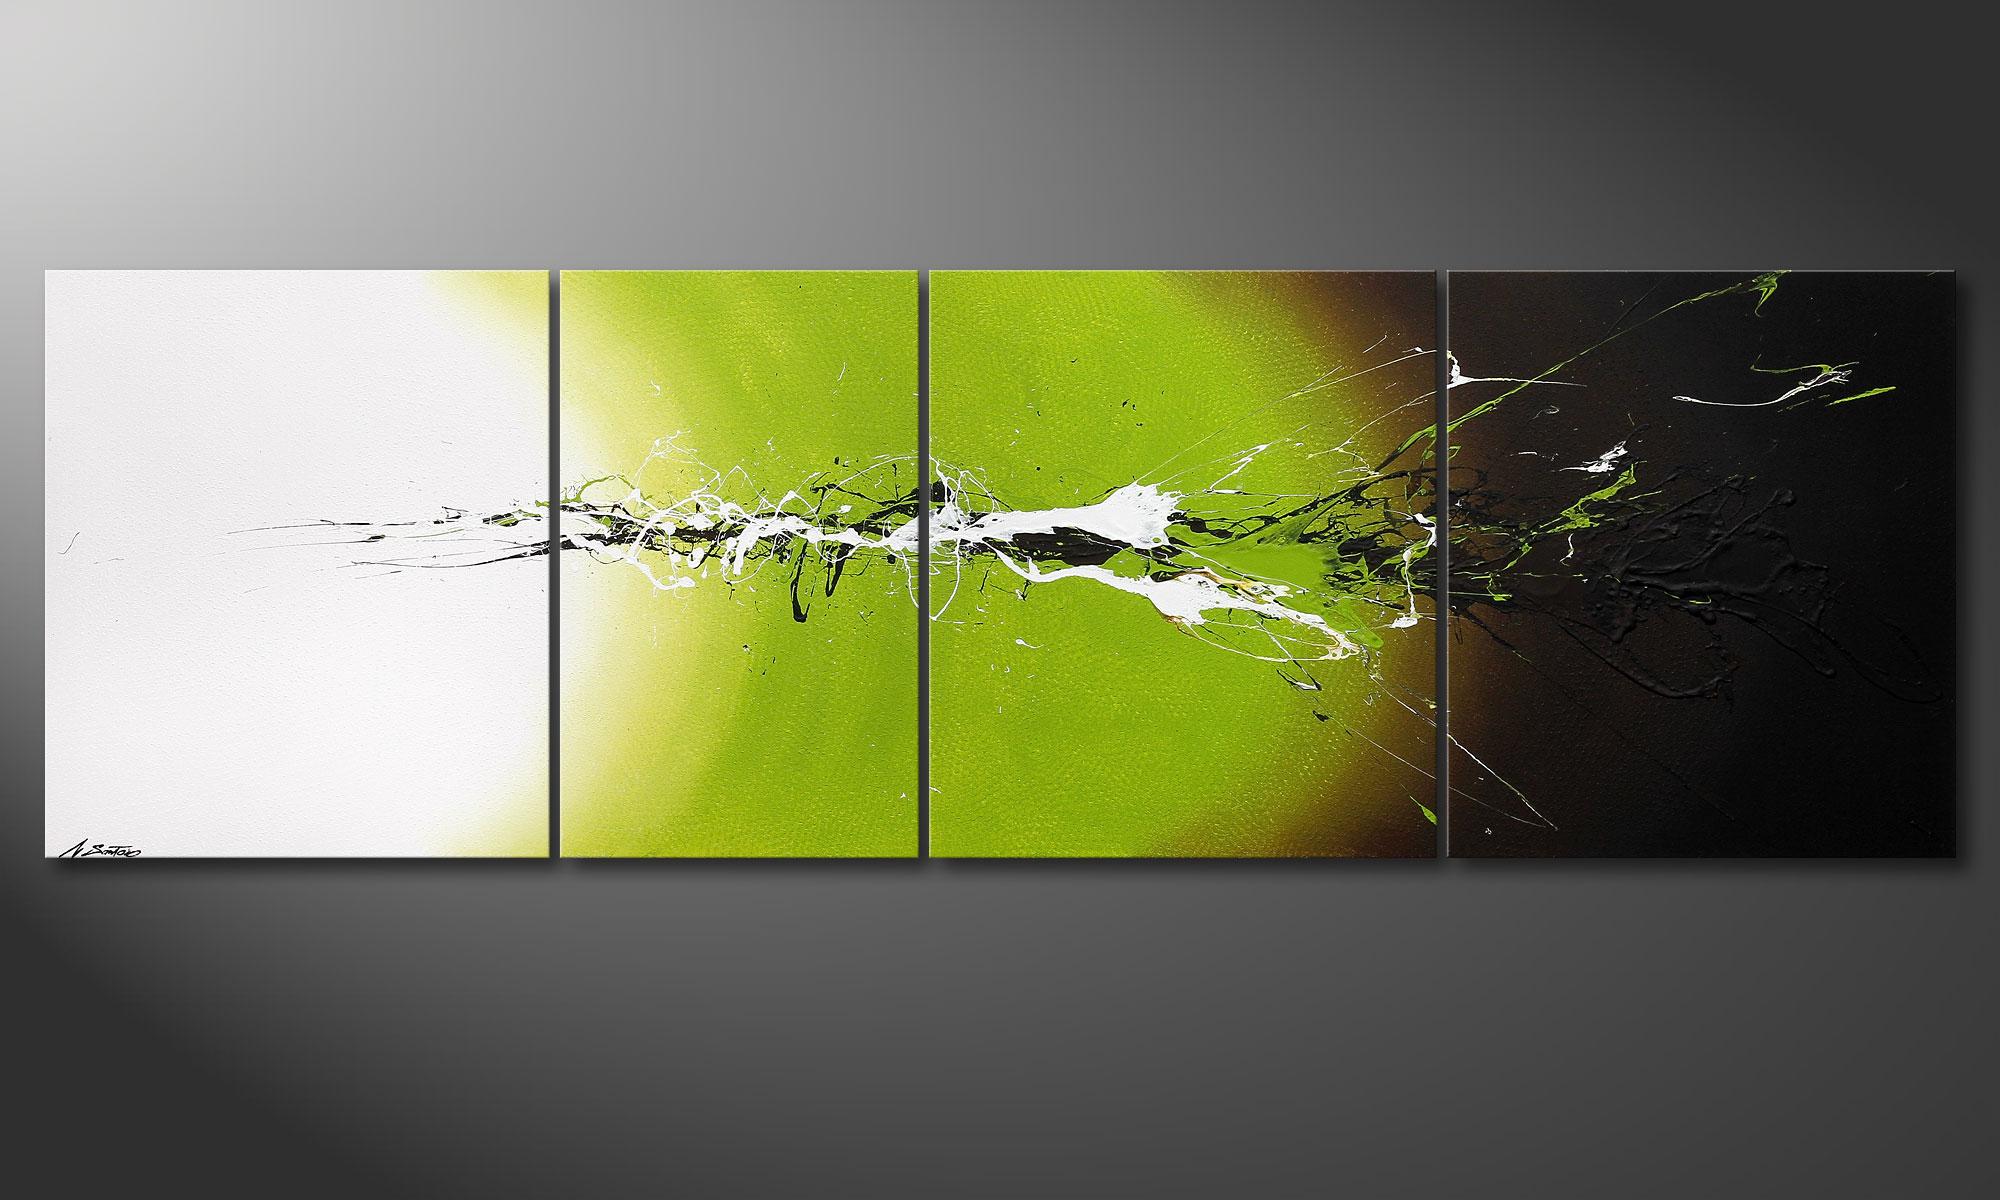 La peinture grand format juicy splash 260x80cm tableaux xxl - Tableau peinture grand format ...